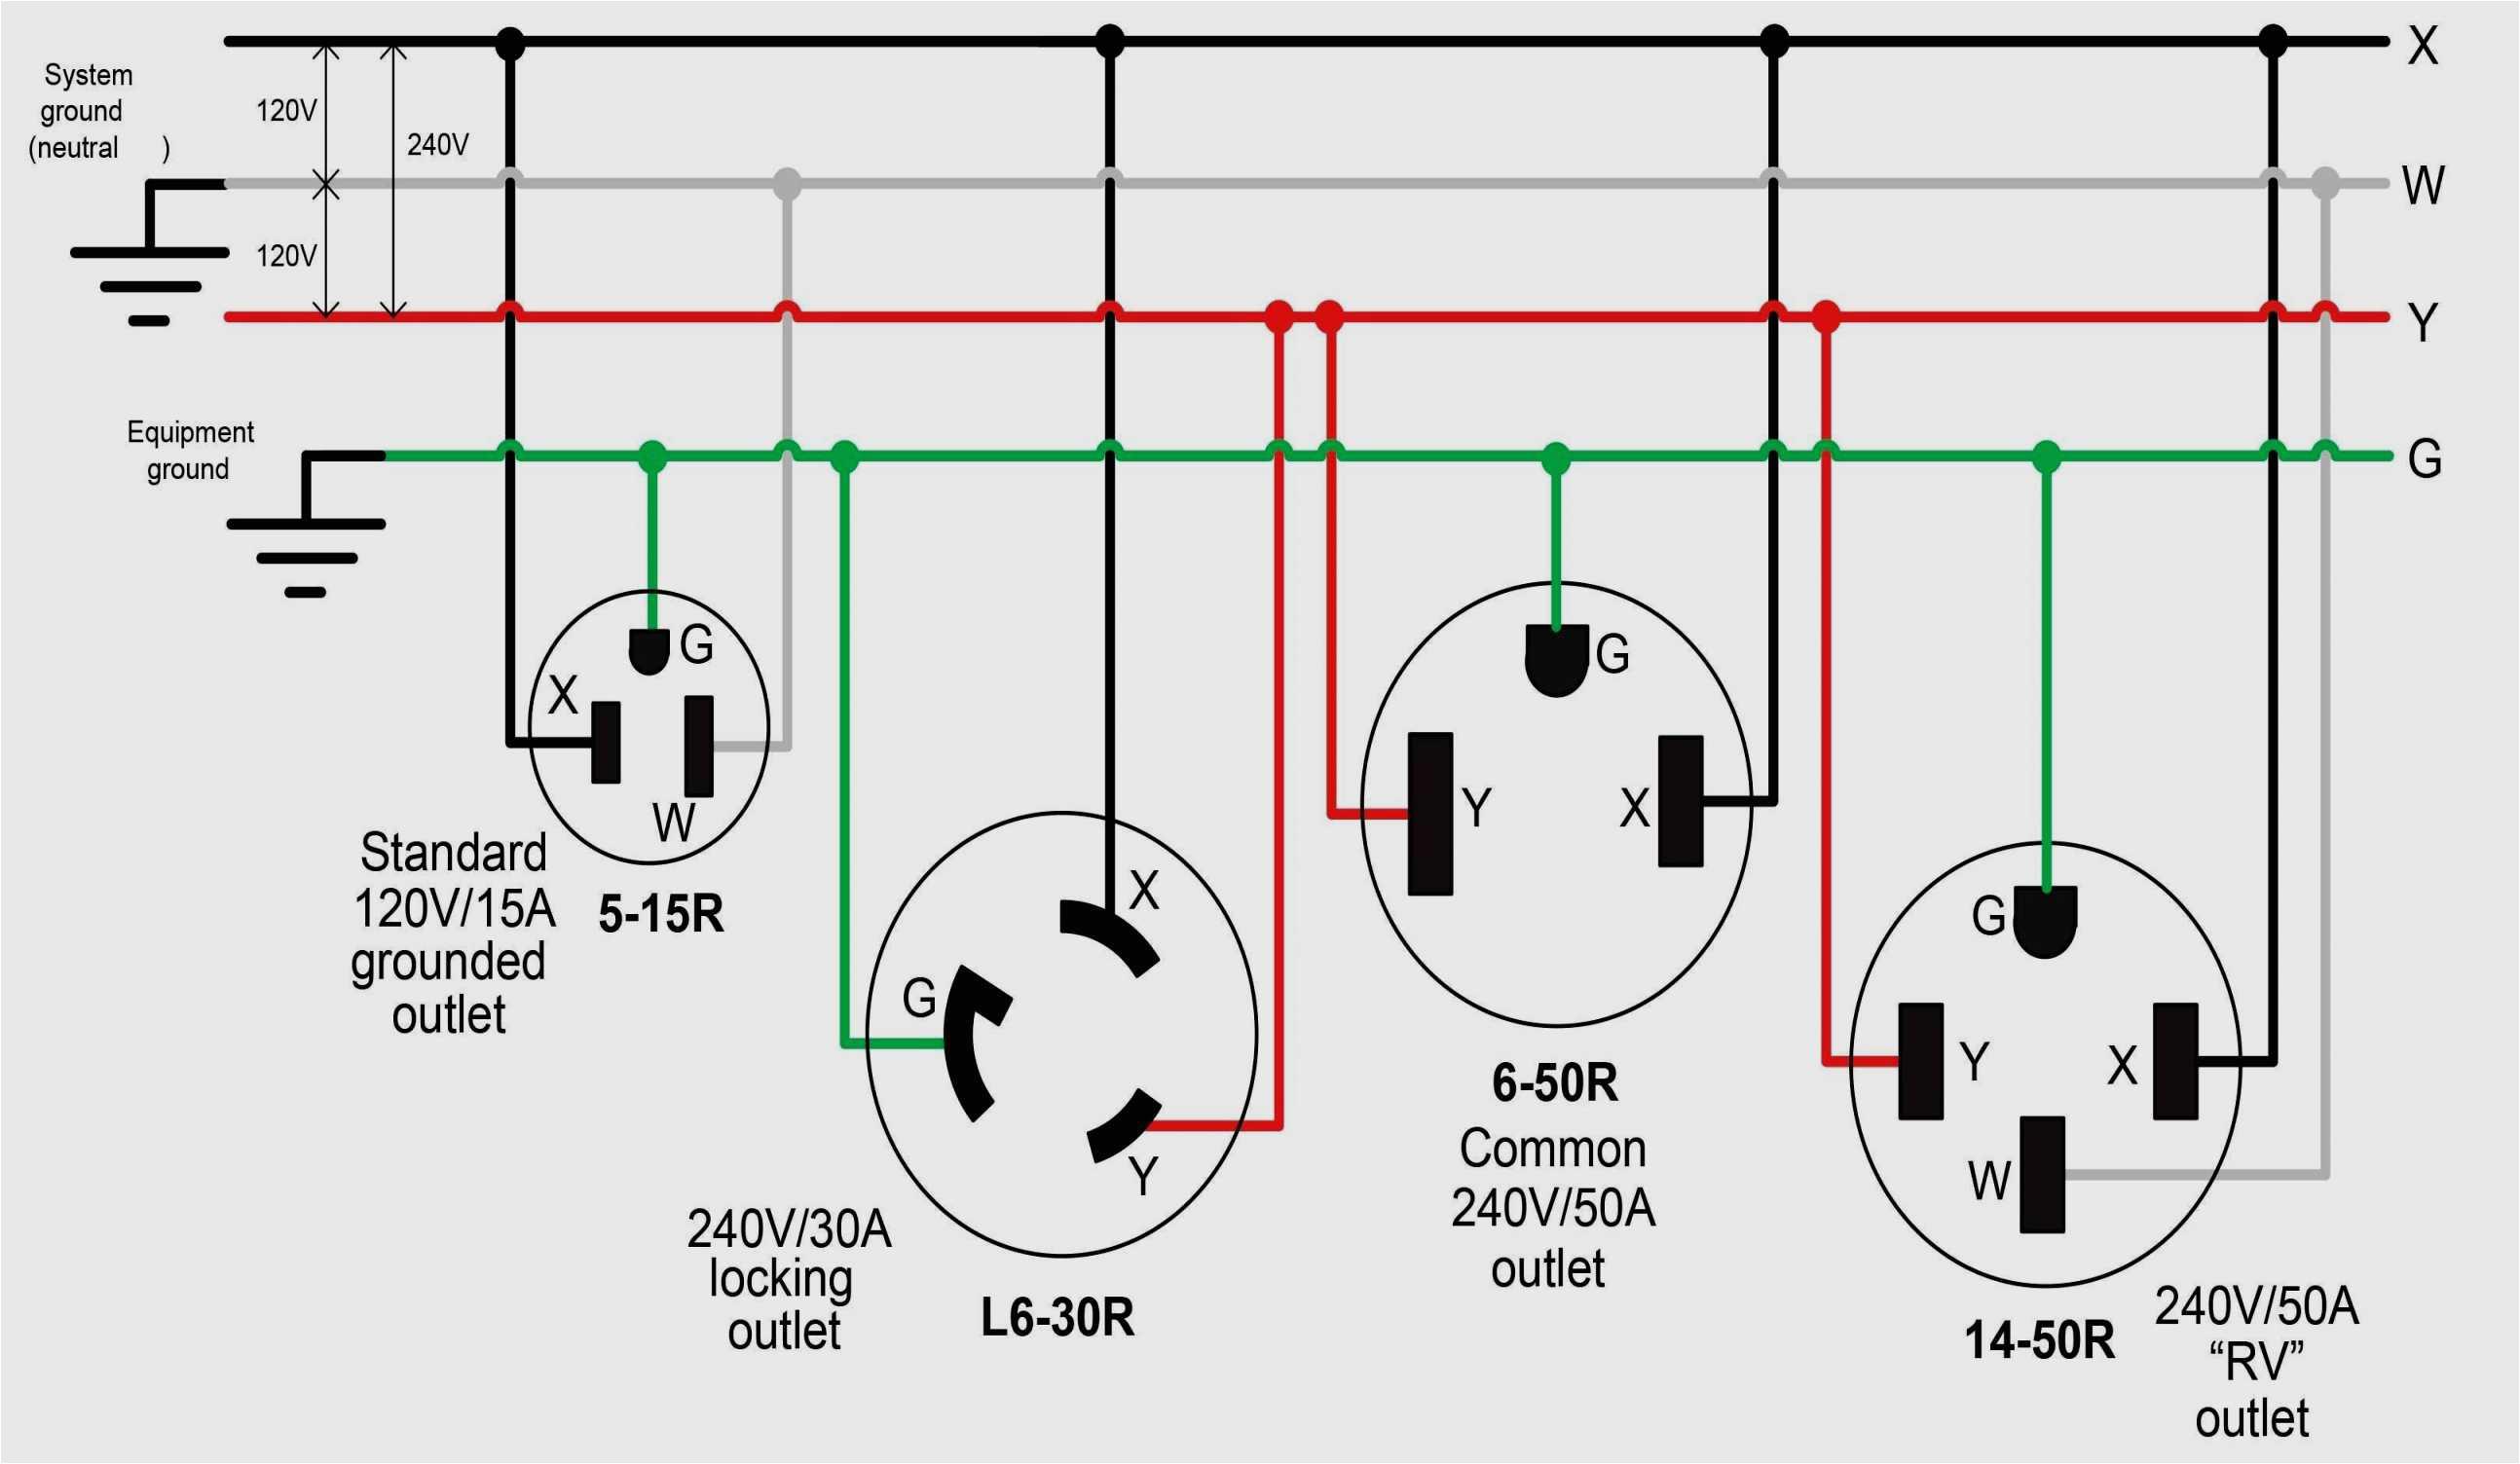 nema 15 50 plug wiring diagram wiring diagram datasourcenema l6 15r wiring diagram wiring diagram datasource